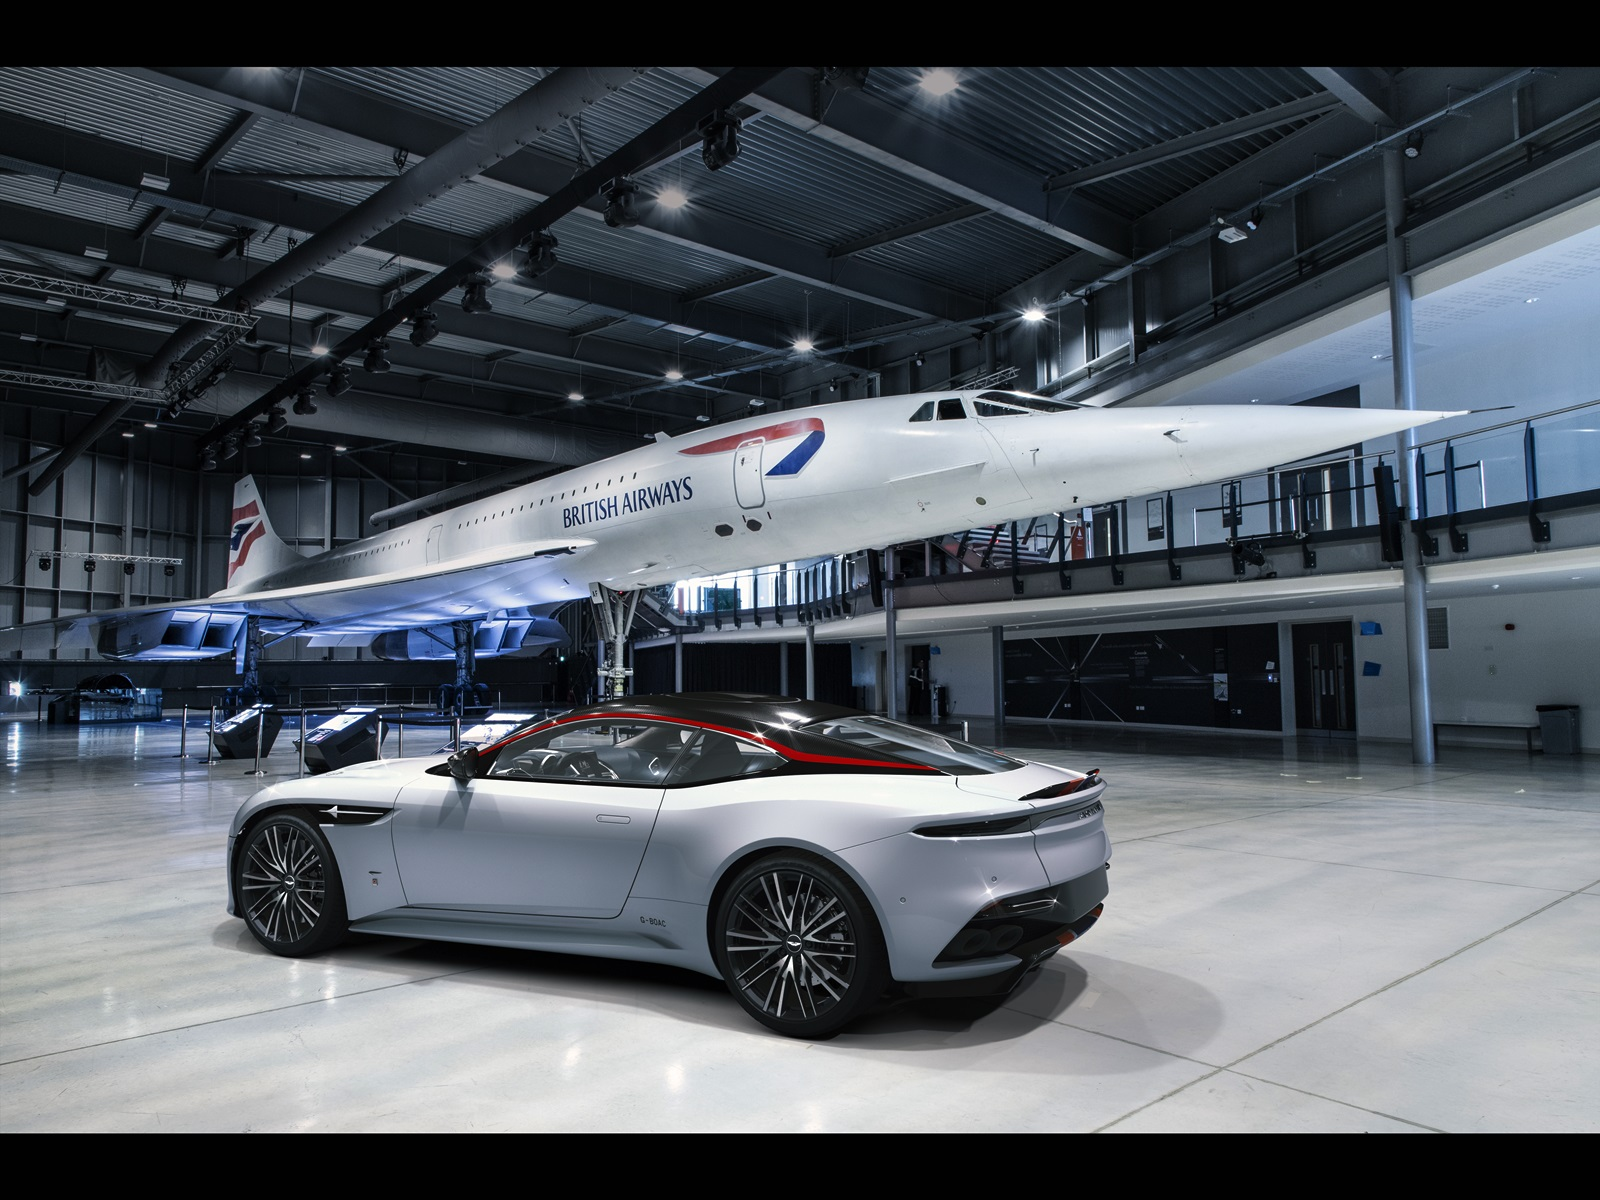 Aston Martin Dbs Superleggera Concorde (3)